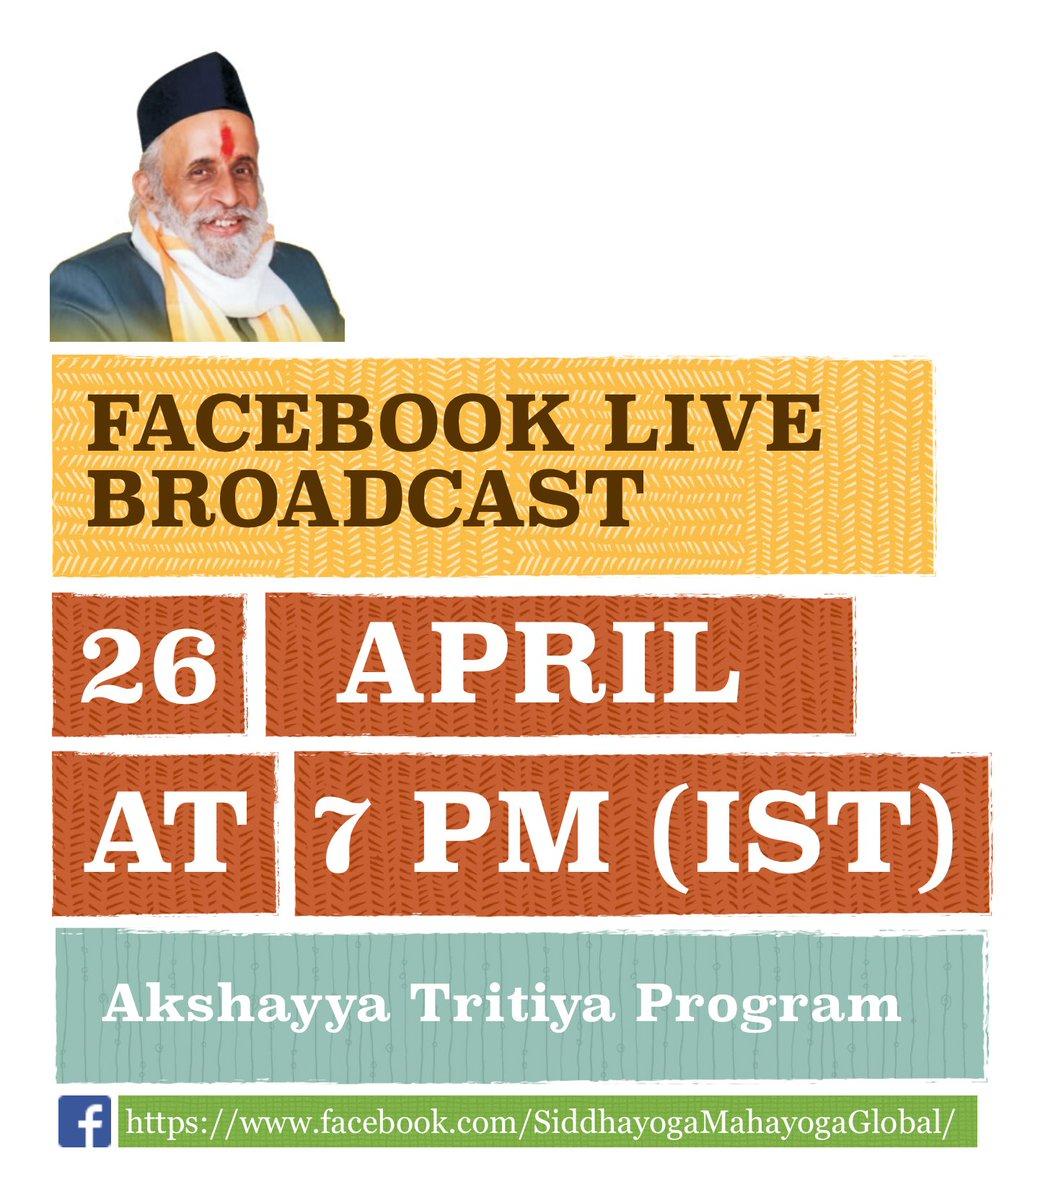 Akshayya Tritiya Program Facebook Live Broadcast on 26th April 2020 at 7 PM (Indian Standard Time) at https://t.co/5q4BtqXR30  #Mahayoga #LIVESCREENING #AkshayaTritiya https://t.co/tijuTuqEaP